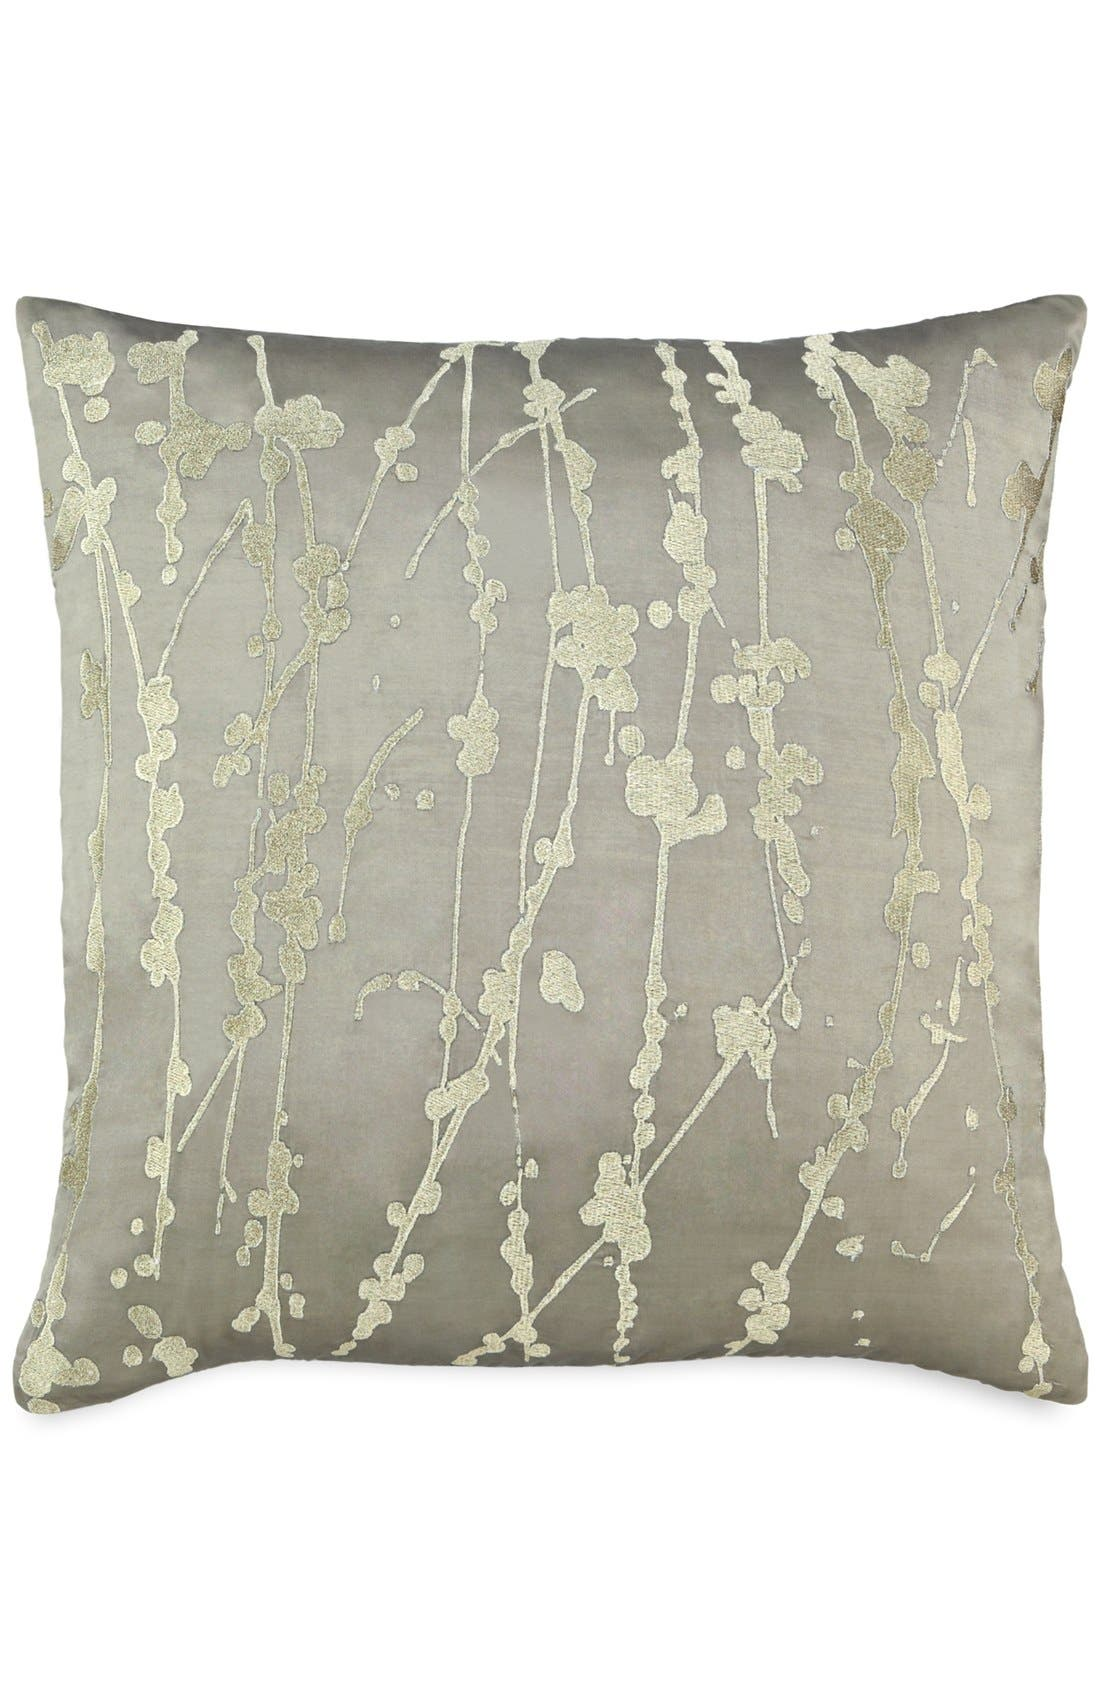 Main Image - Donna Karan Metallic Embroidered Silk Pillow (Online Only)